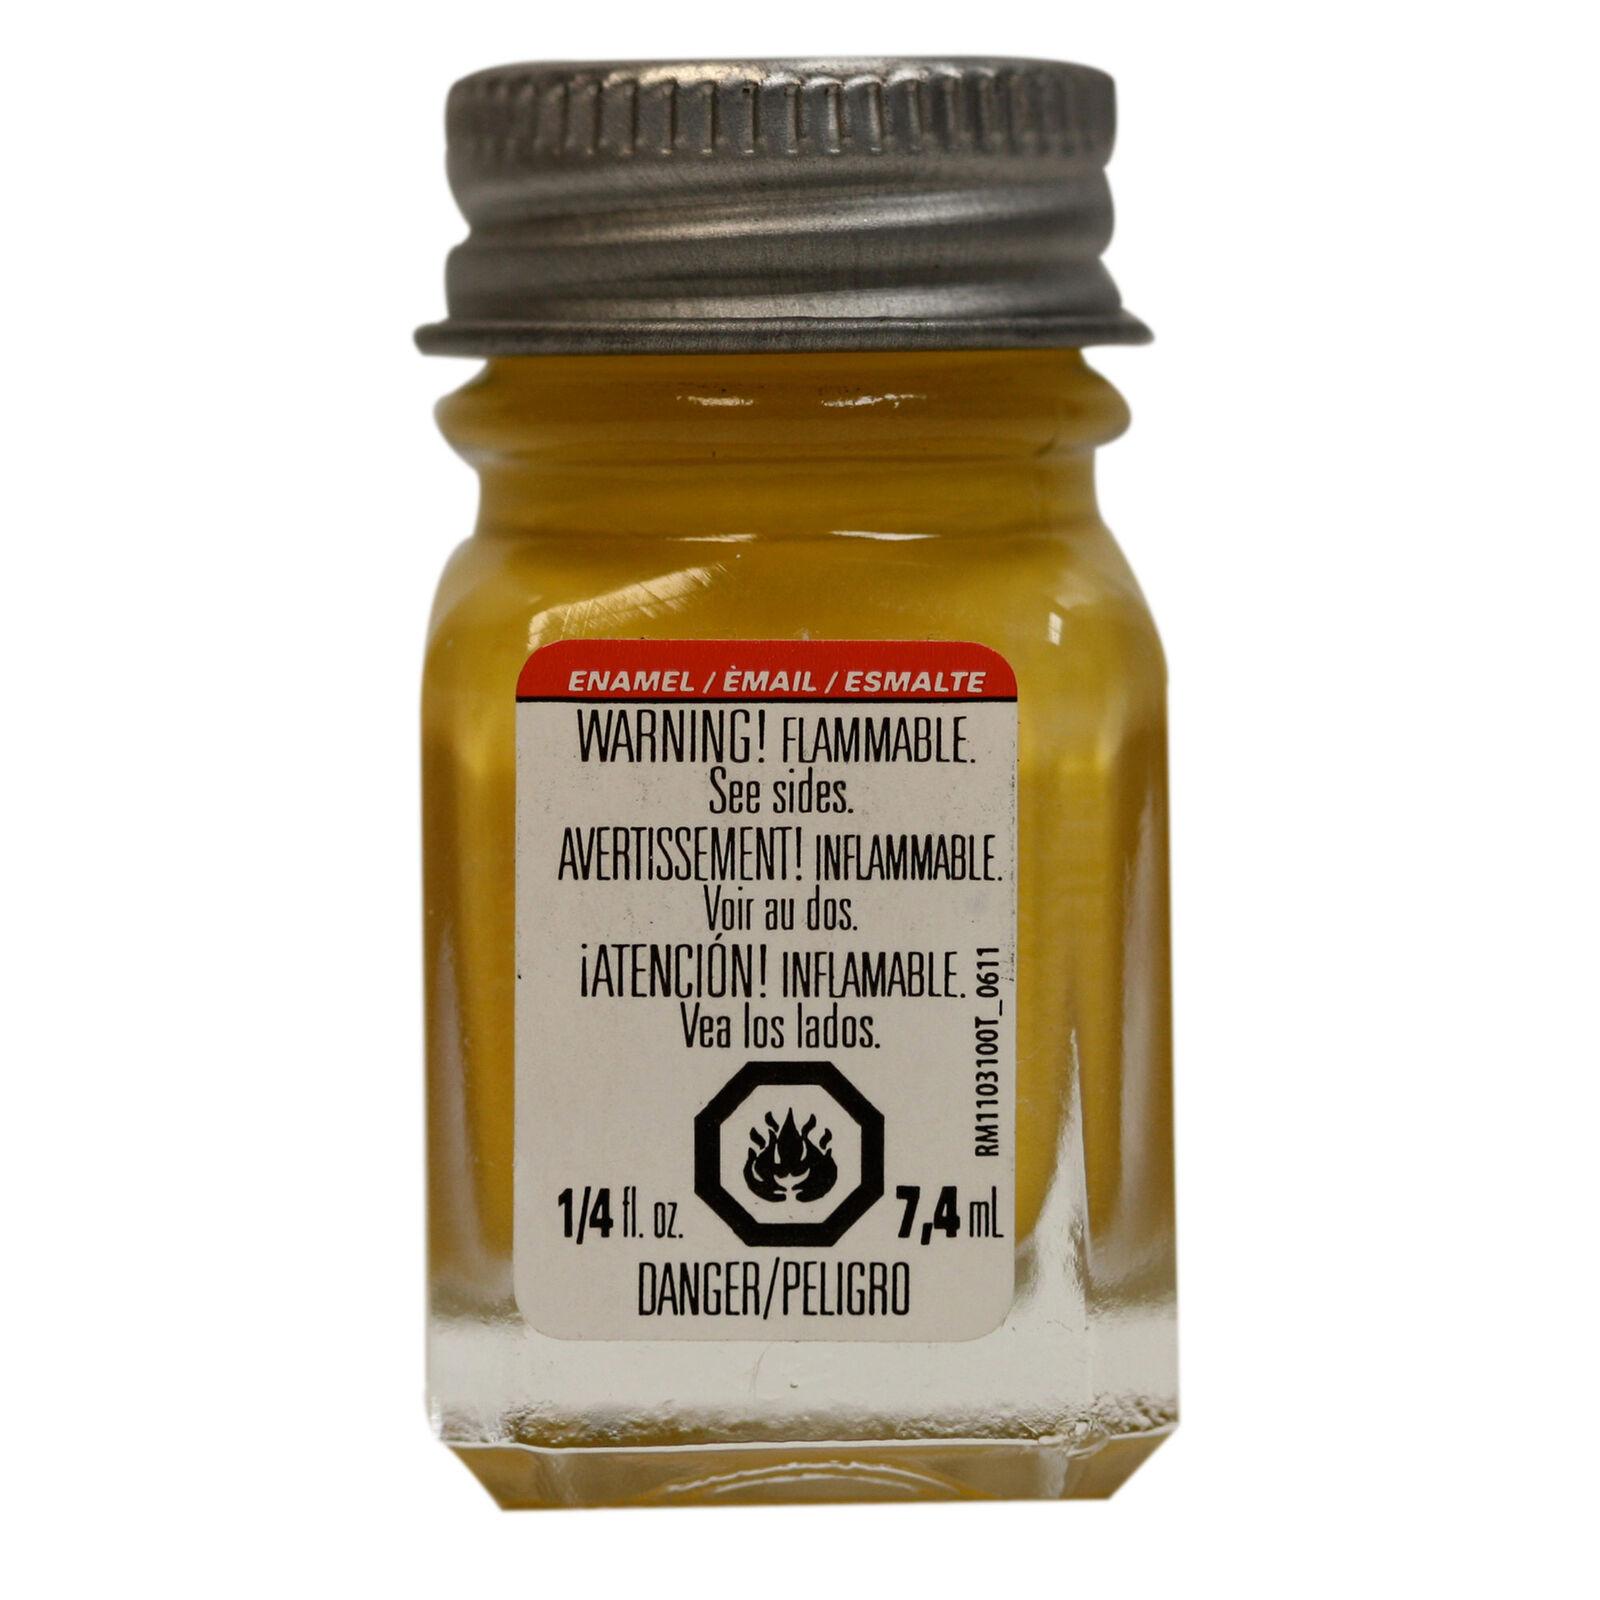 Enamel 1/4 oz Yellow